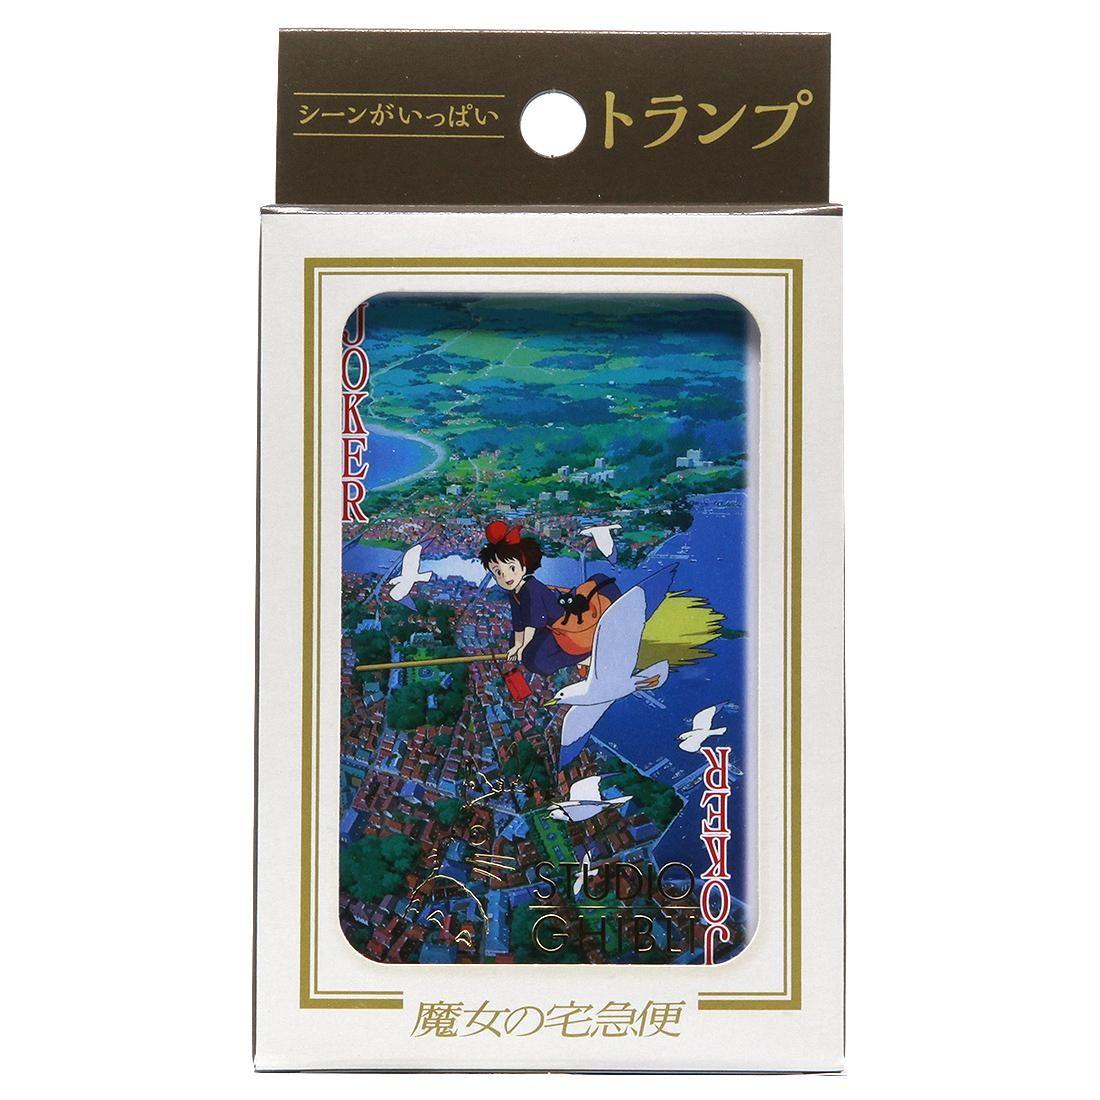 Studio Ghibli Ensky Kiki's Delivery Service Movie Scenes Playing Cards (pink)